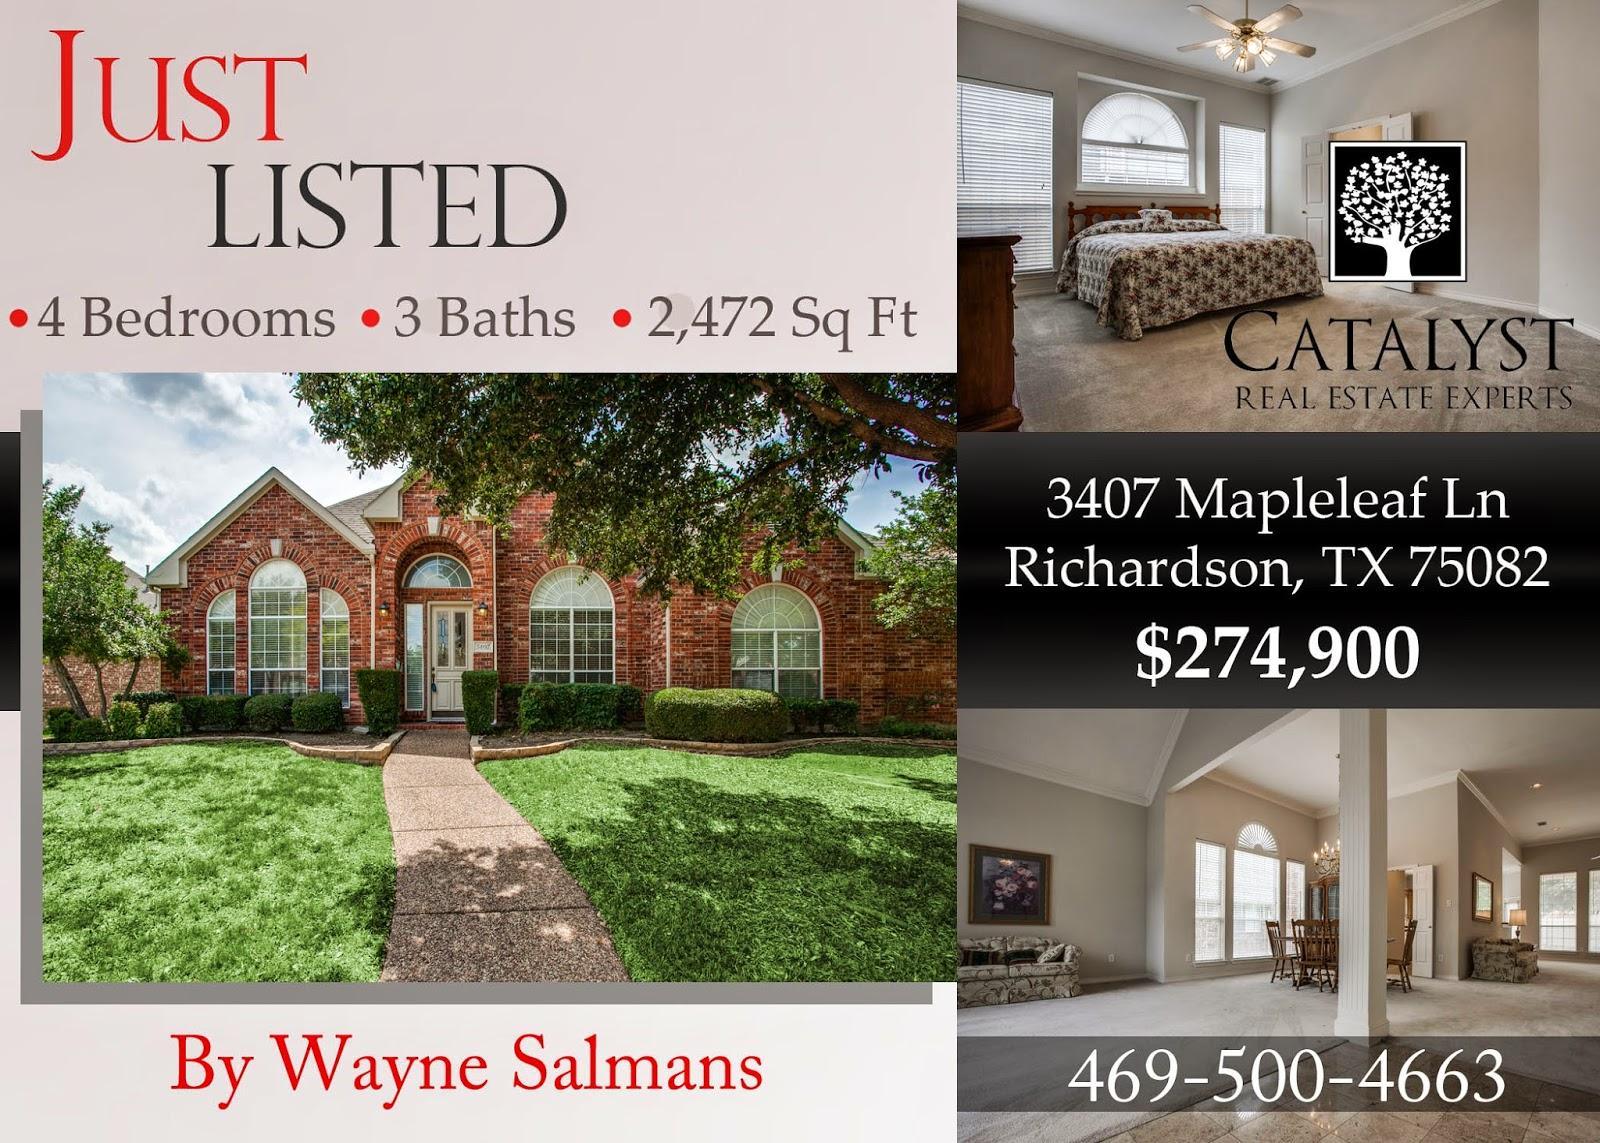 Homes for sale under $300,000 in Dallas